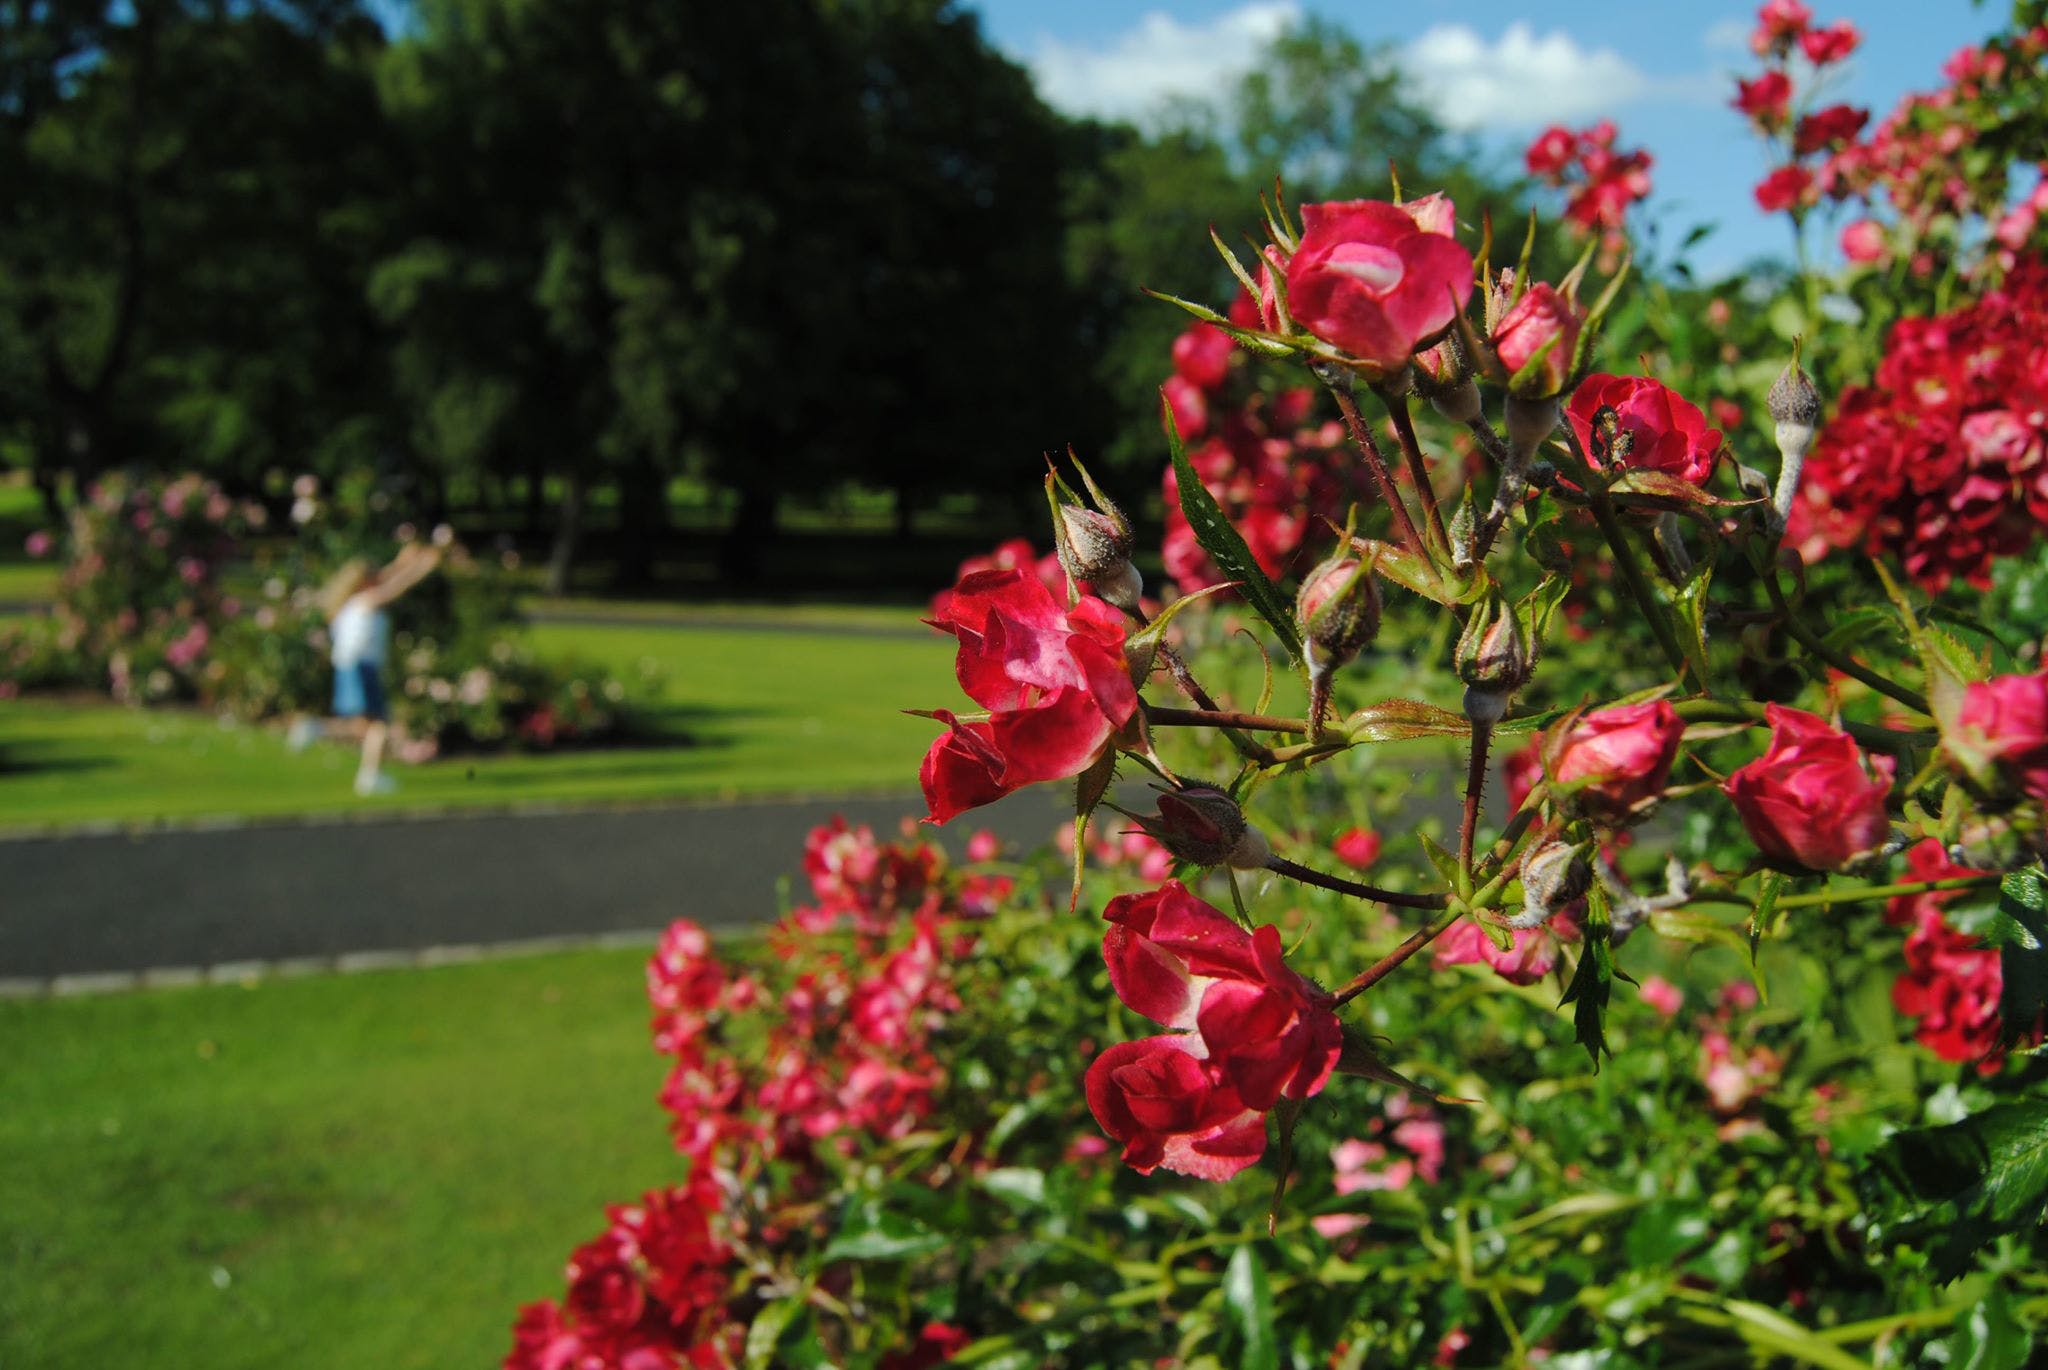 Free stock photo of beautiful flowers, blurred, blurred background, bokeh